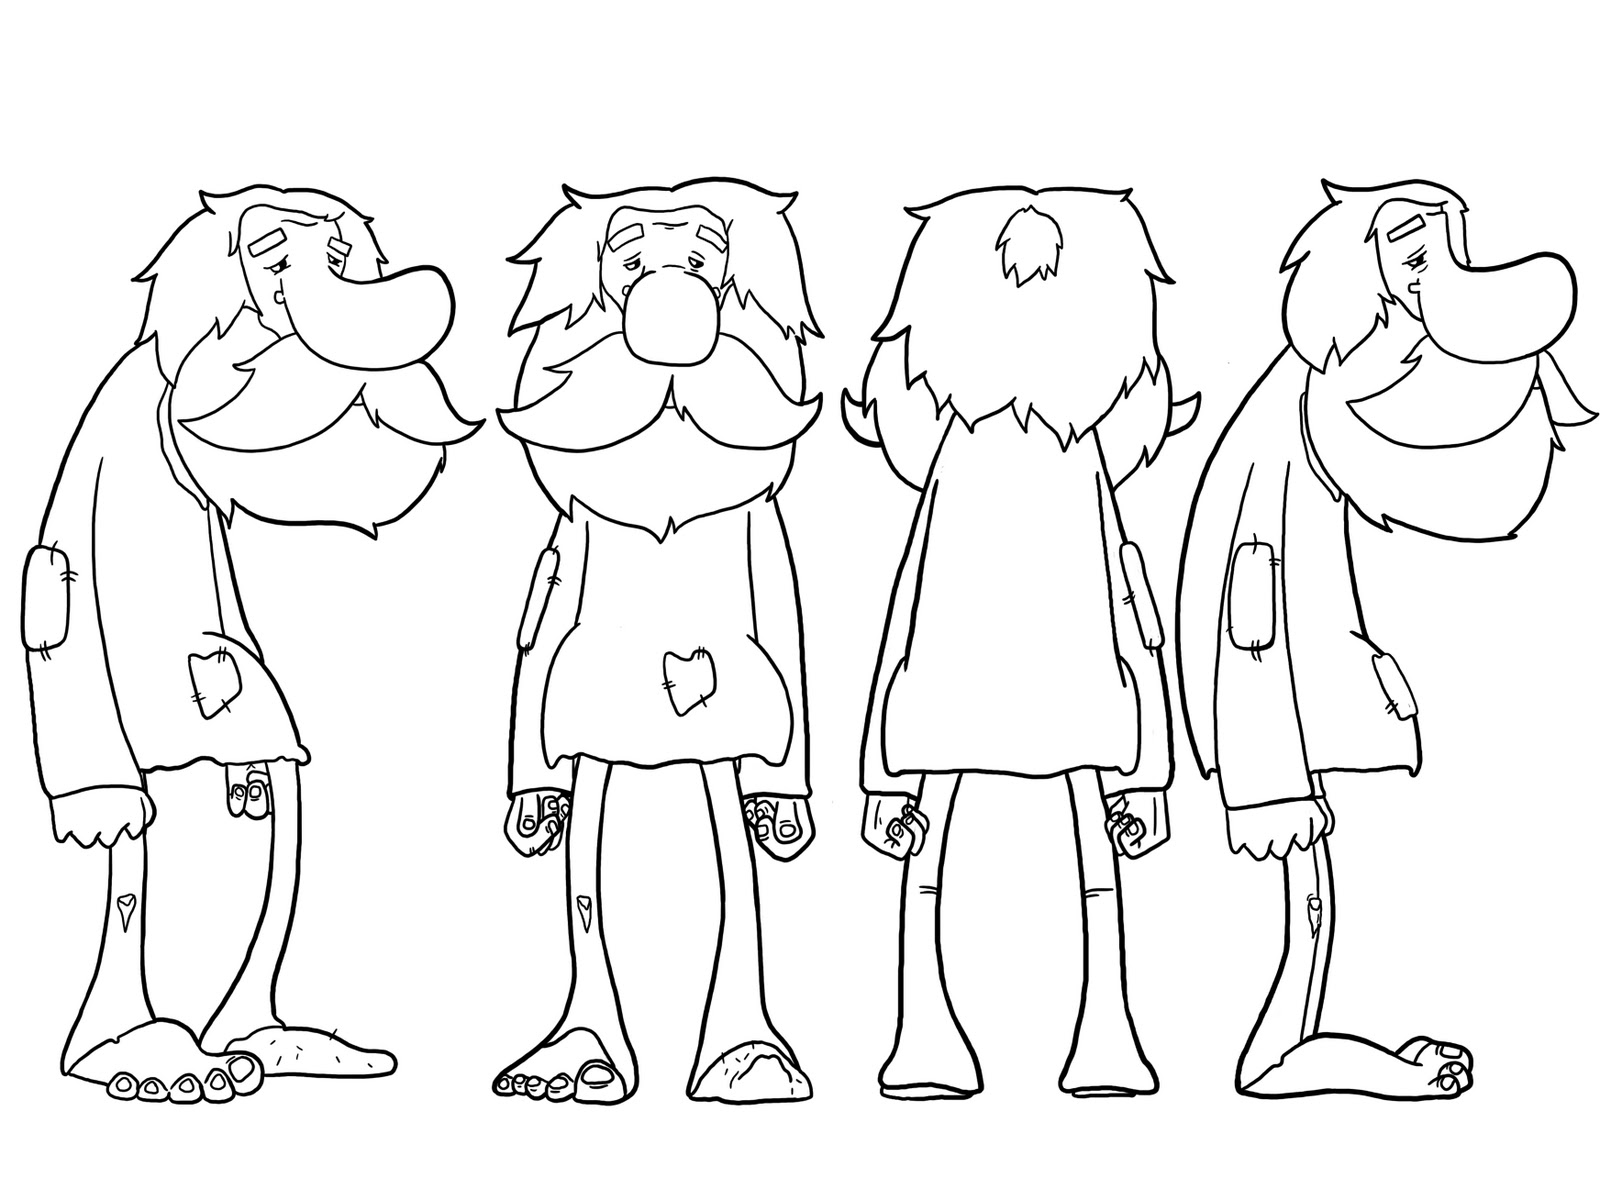 3d Cartoon Drawing At Getdrawings